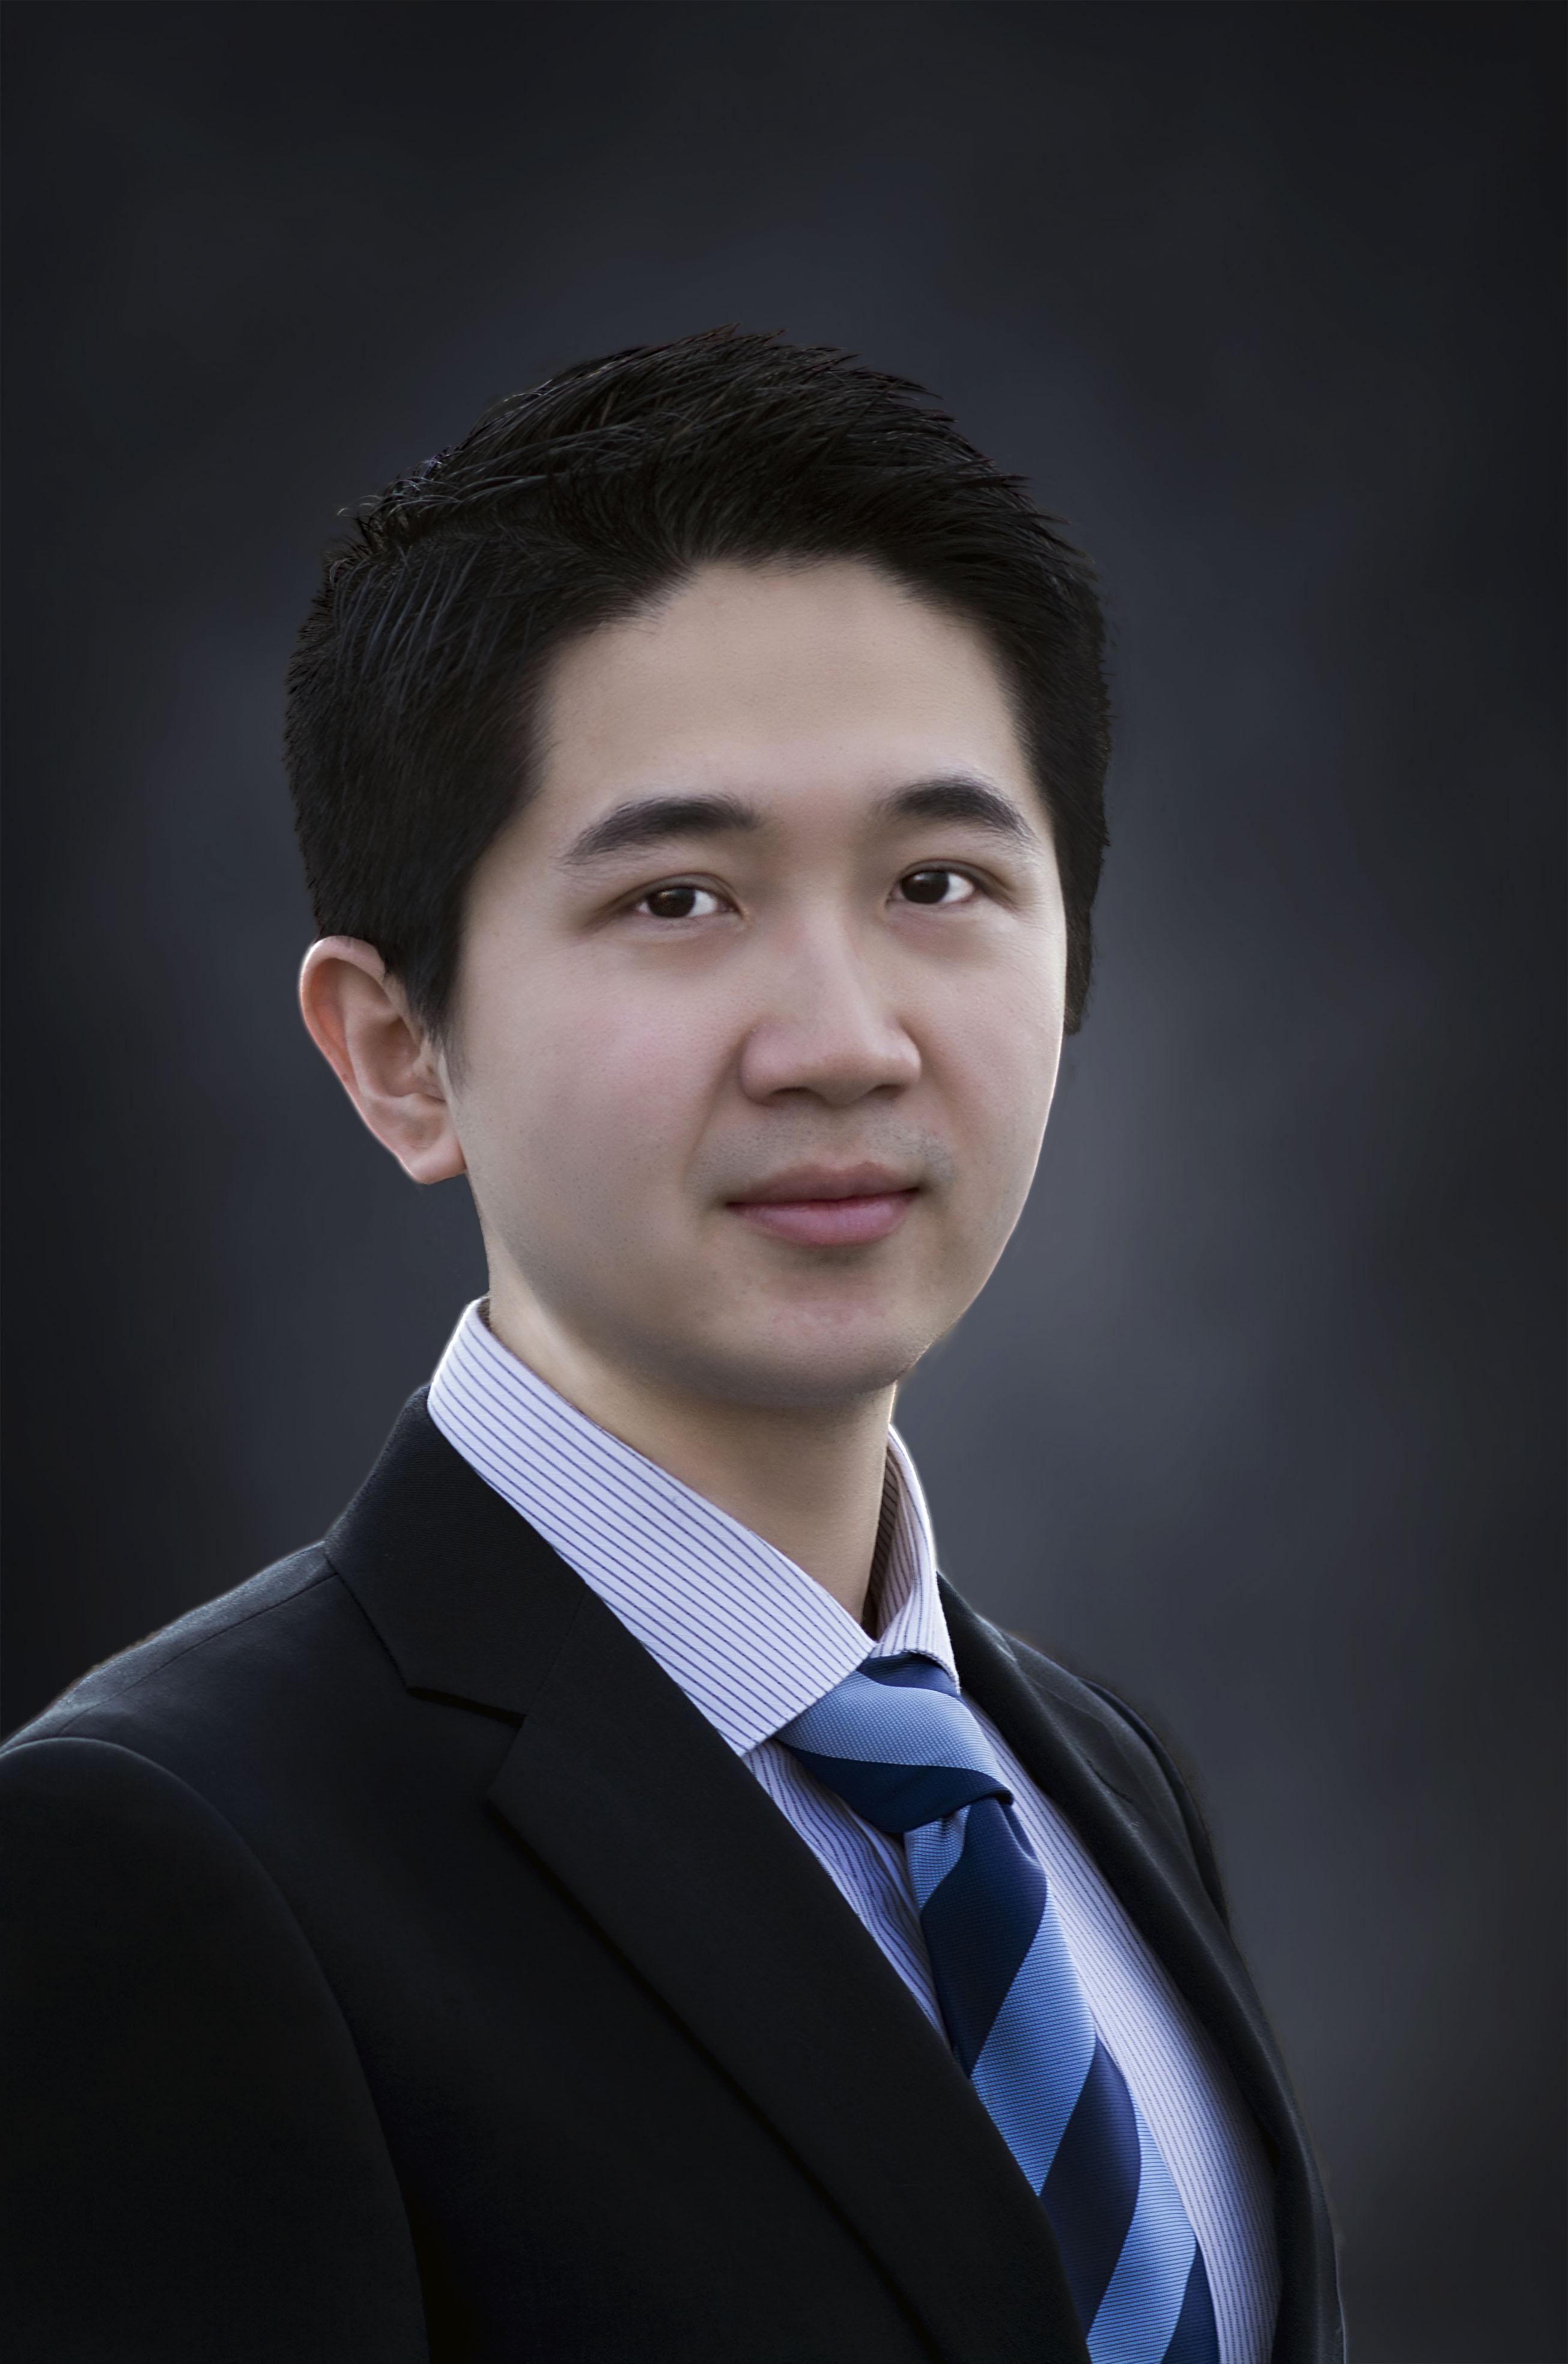 Portrait image of Zichen Miao